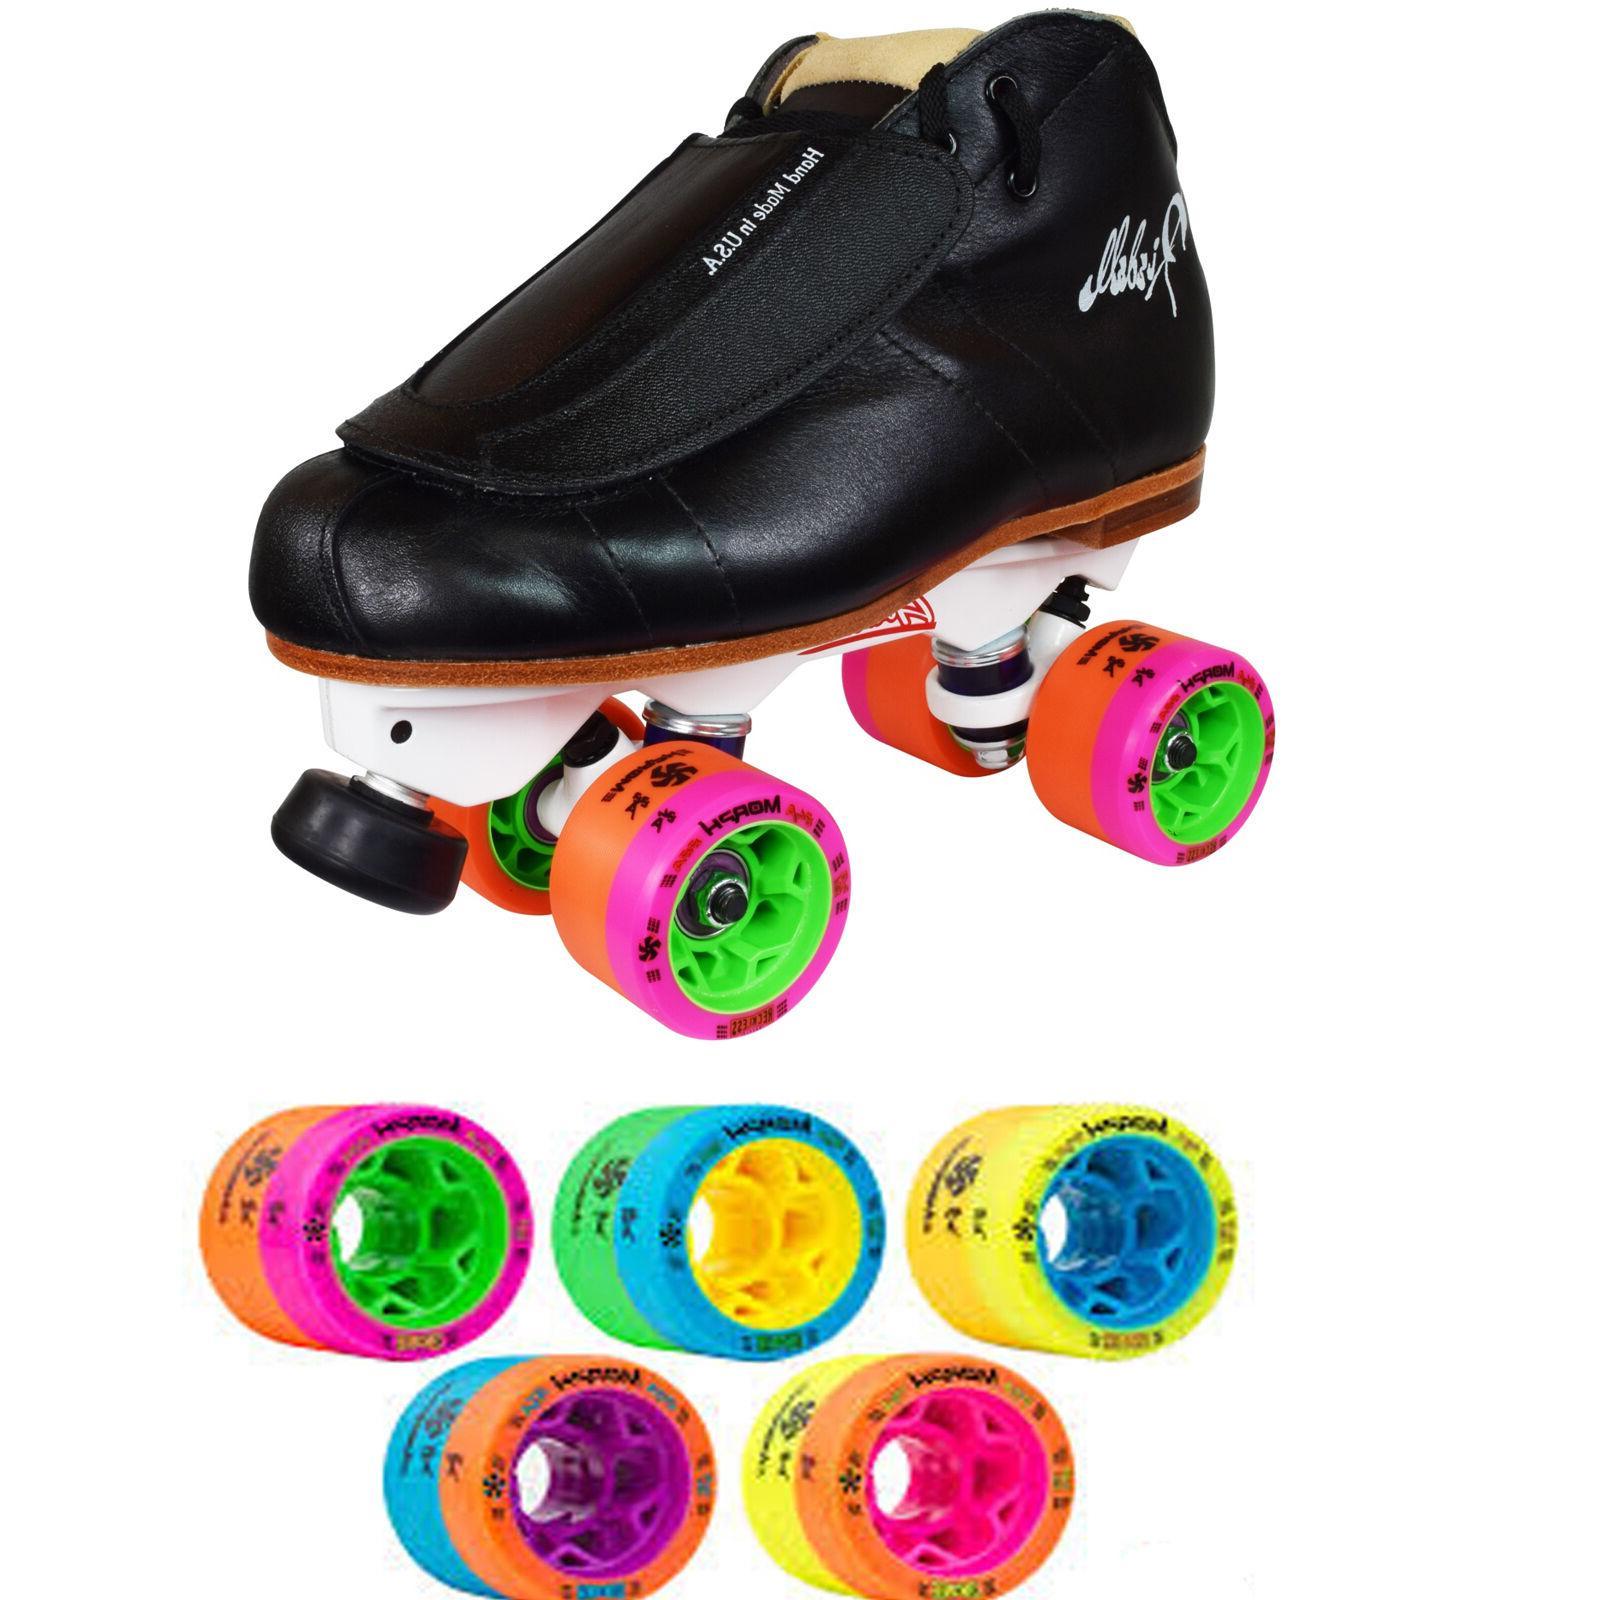 965 avanti magnesium morph speed skates